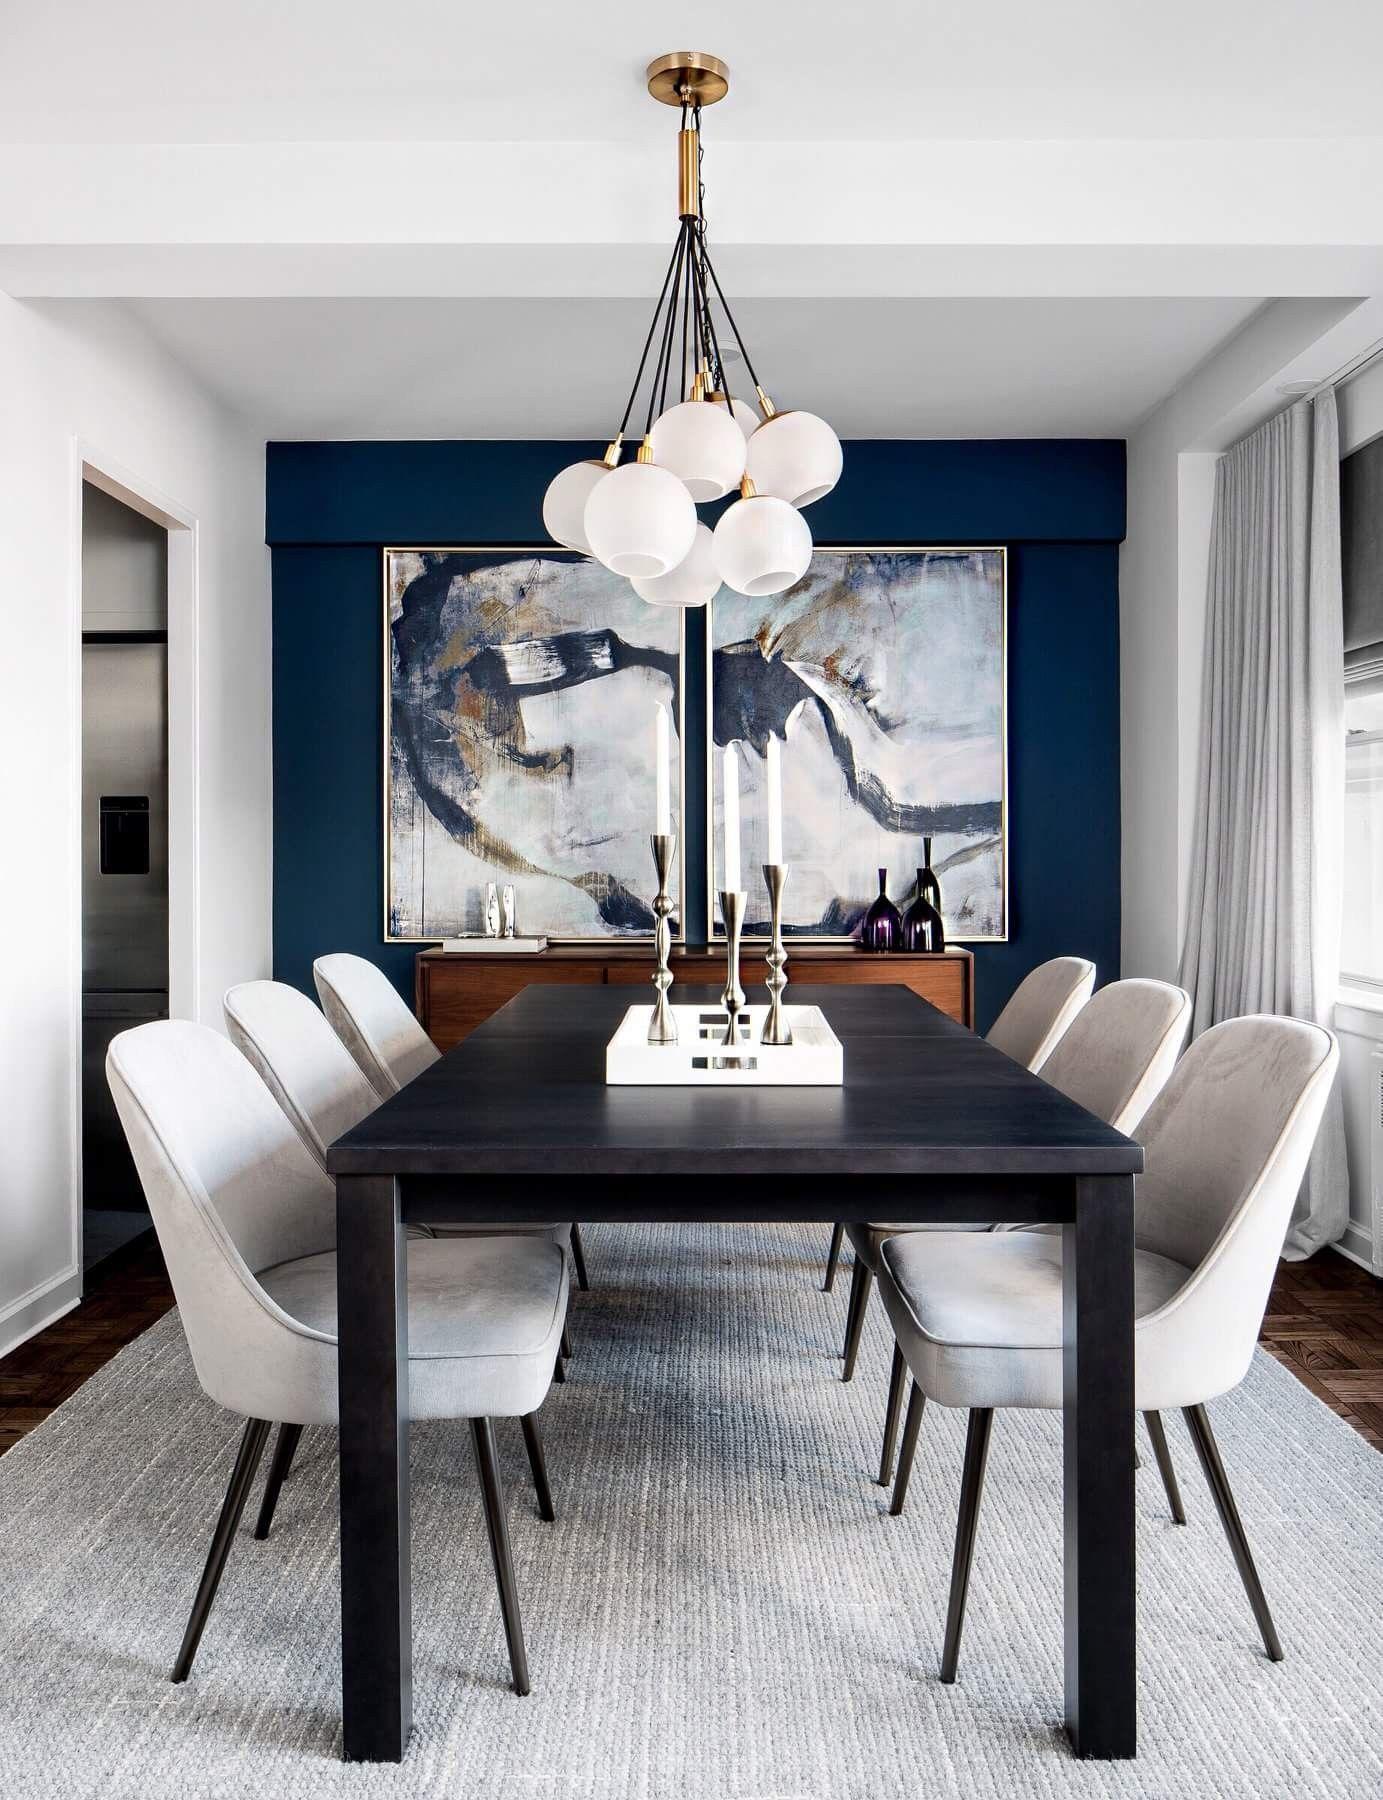 pin by ninetyfourdesign scandinavia on living room ideas on beautiful modern black white living room inspired id=92296